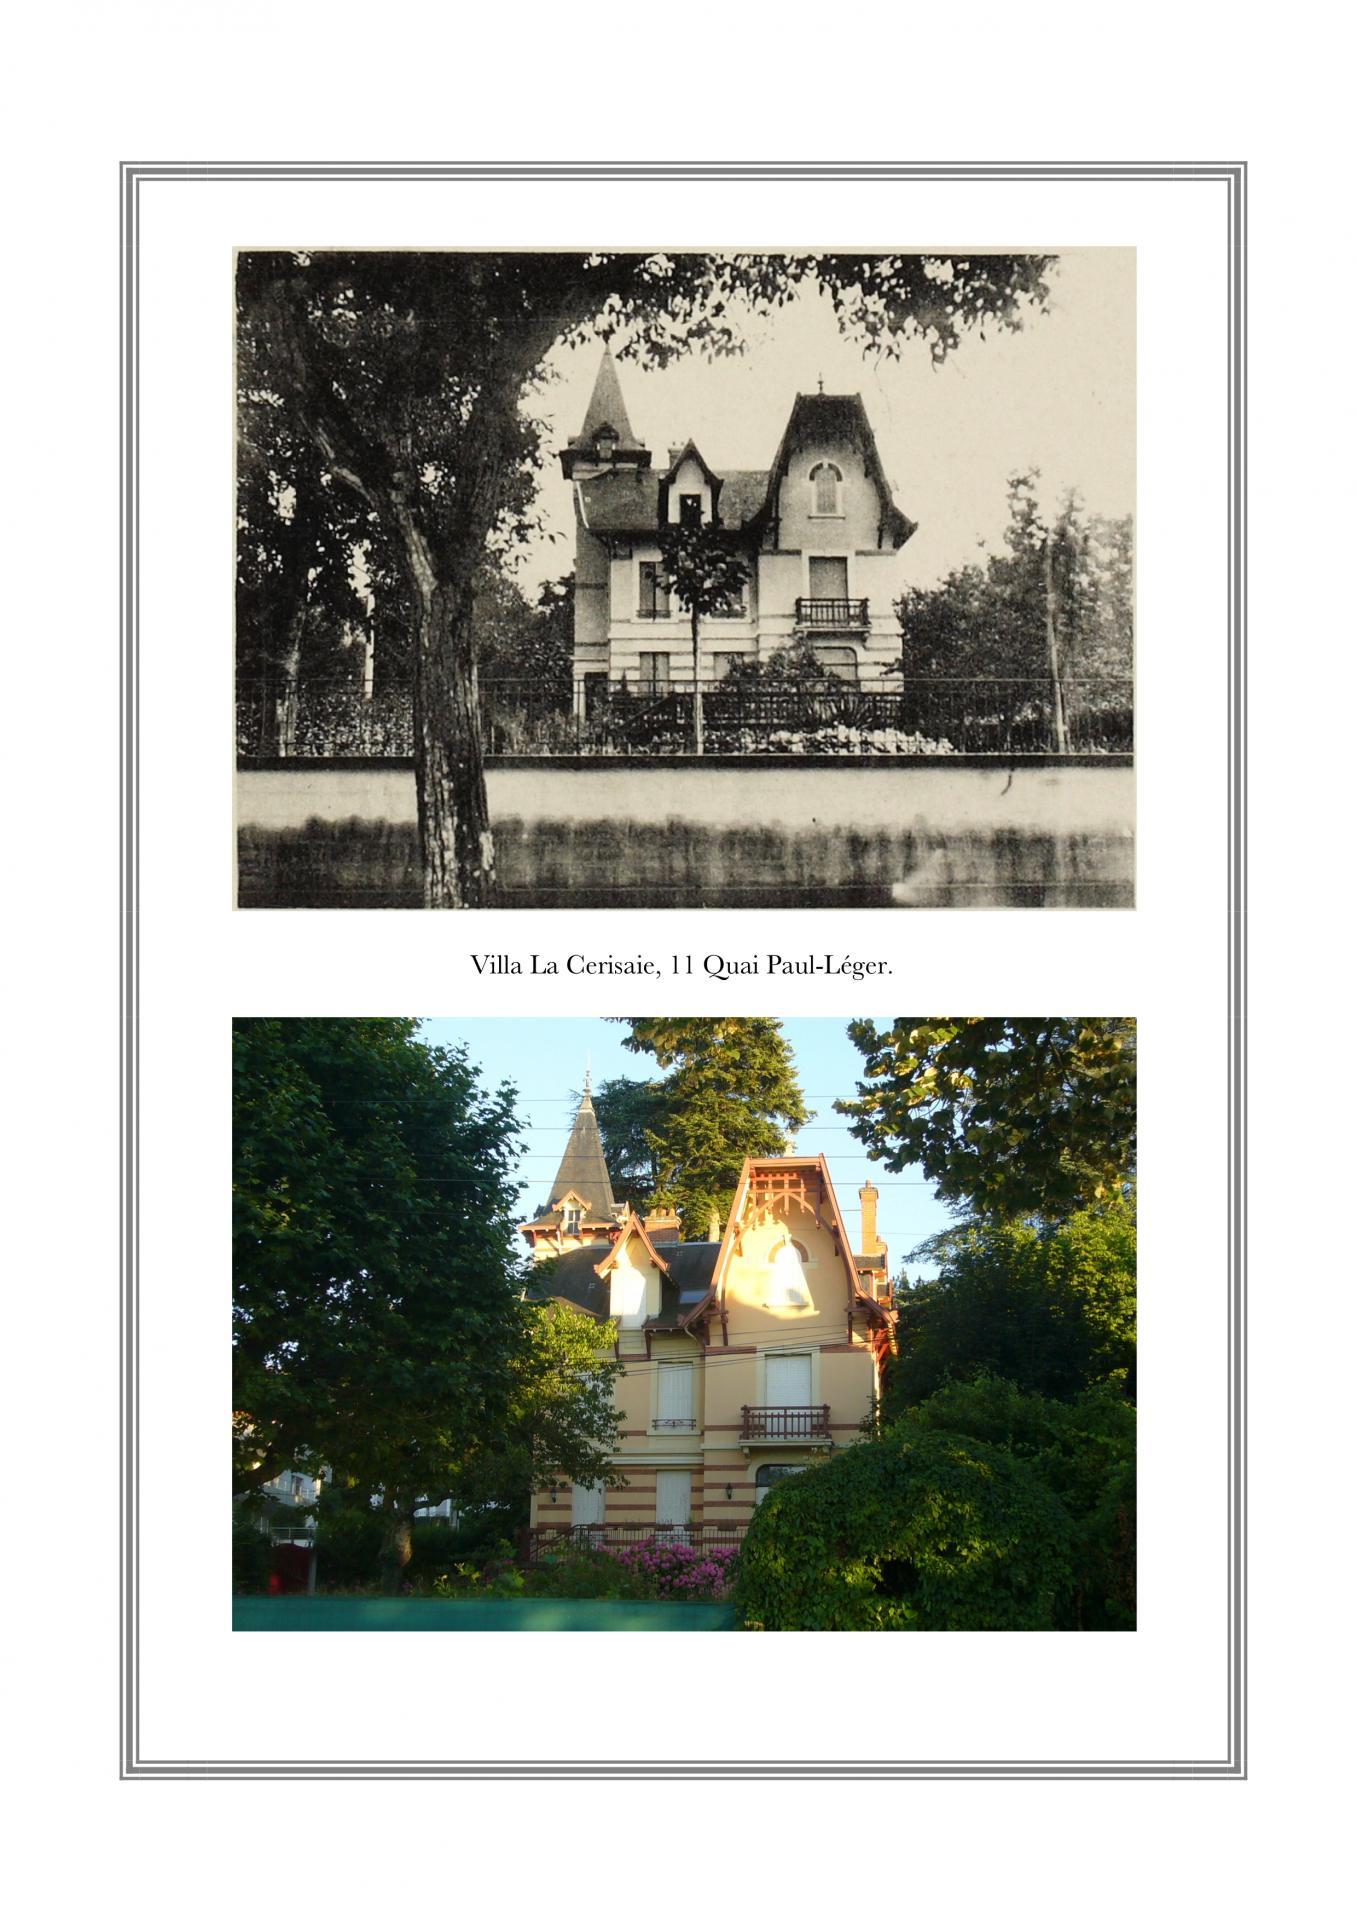 Villa La Cerisaie, 11 Quai Paul-Léger